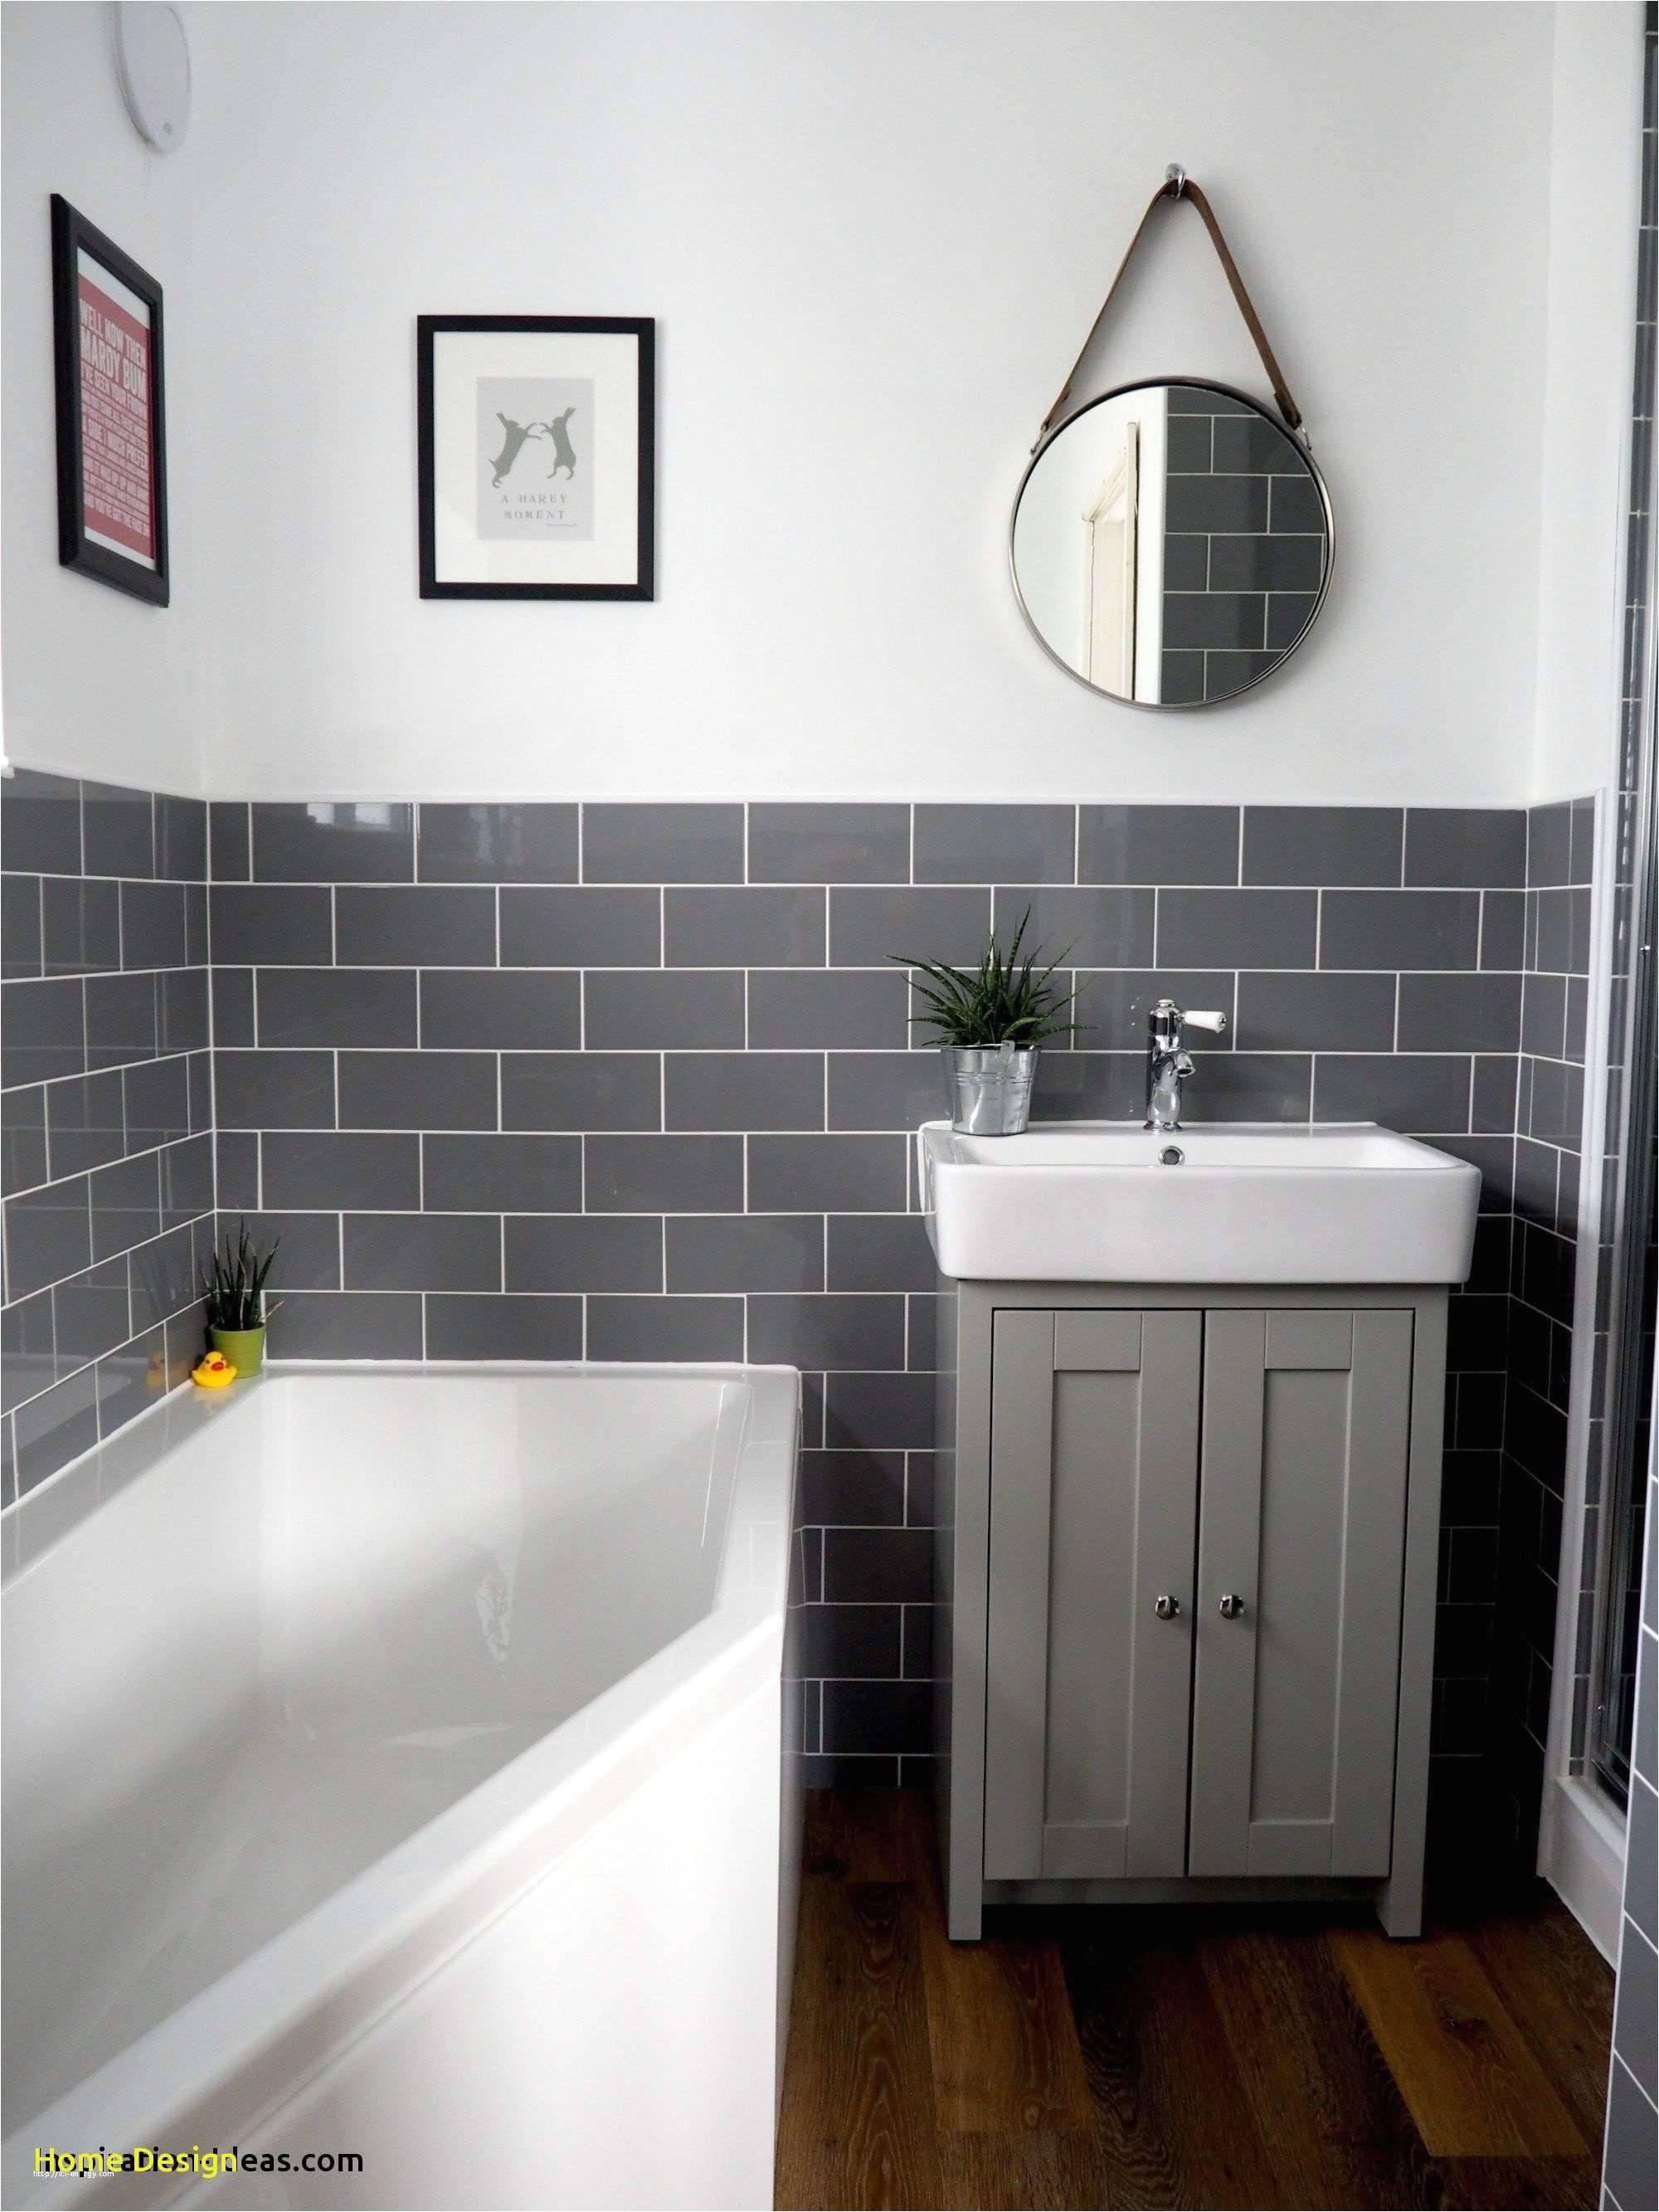 design ideas small bathroom remodel bathroom designs bathroom tile designs for small bathrooms tile of design ideas small bathroom remodel